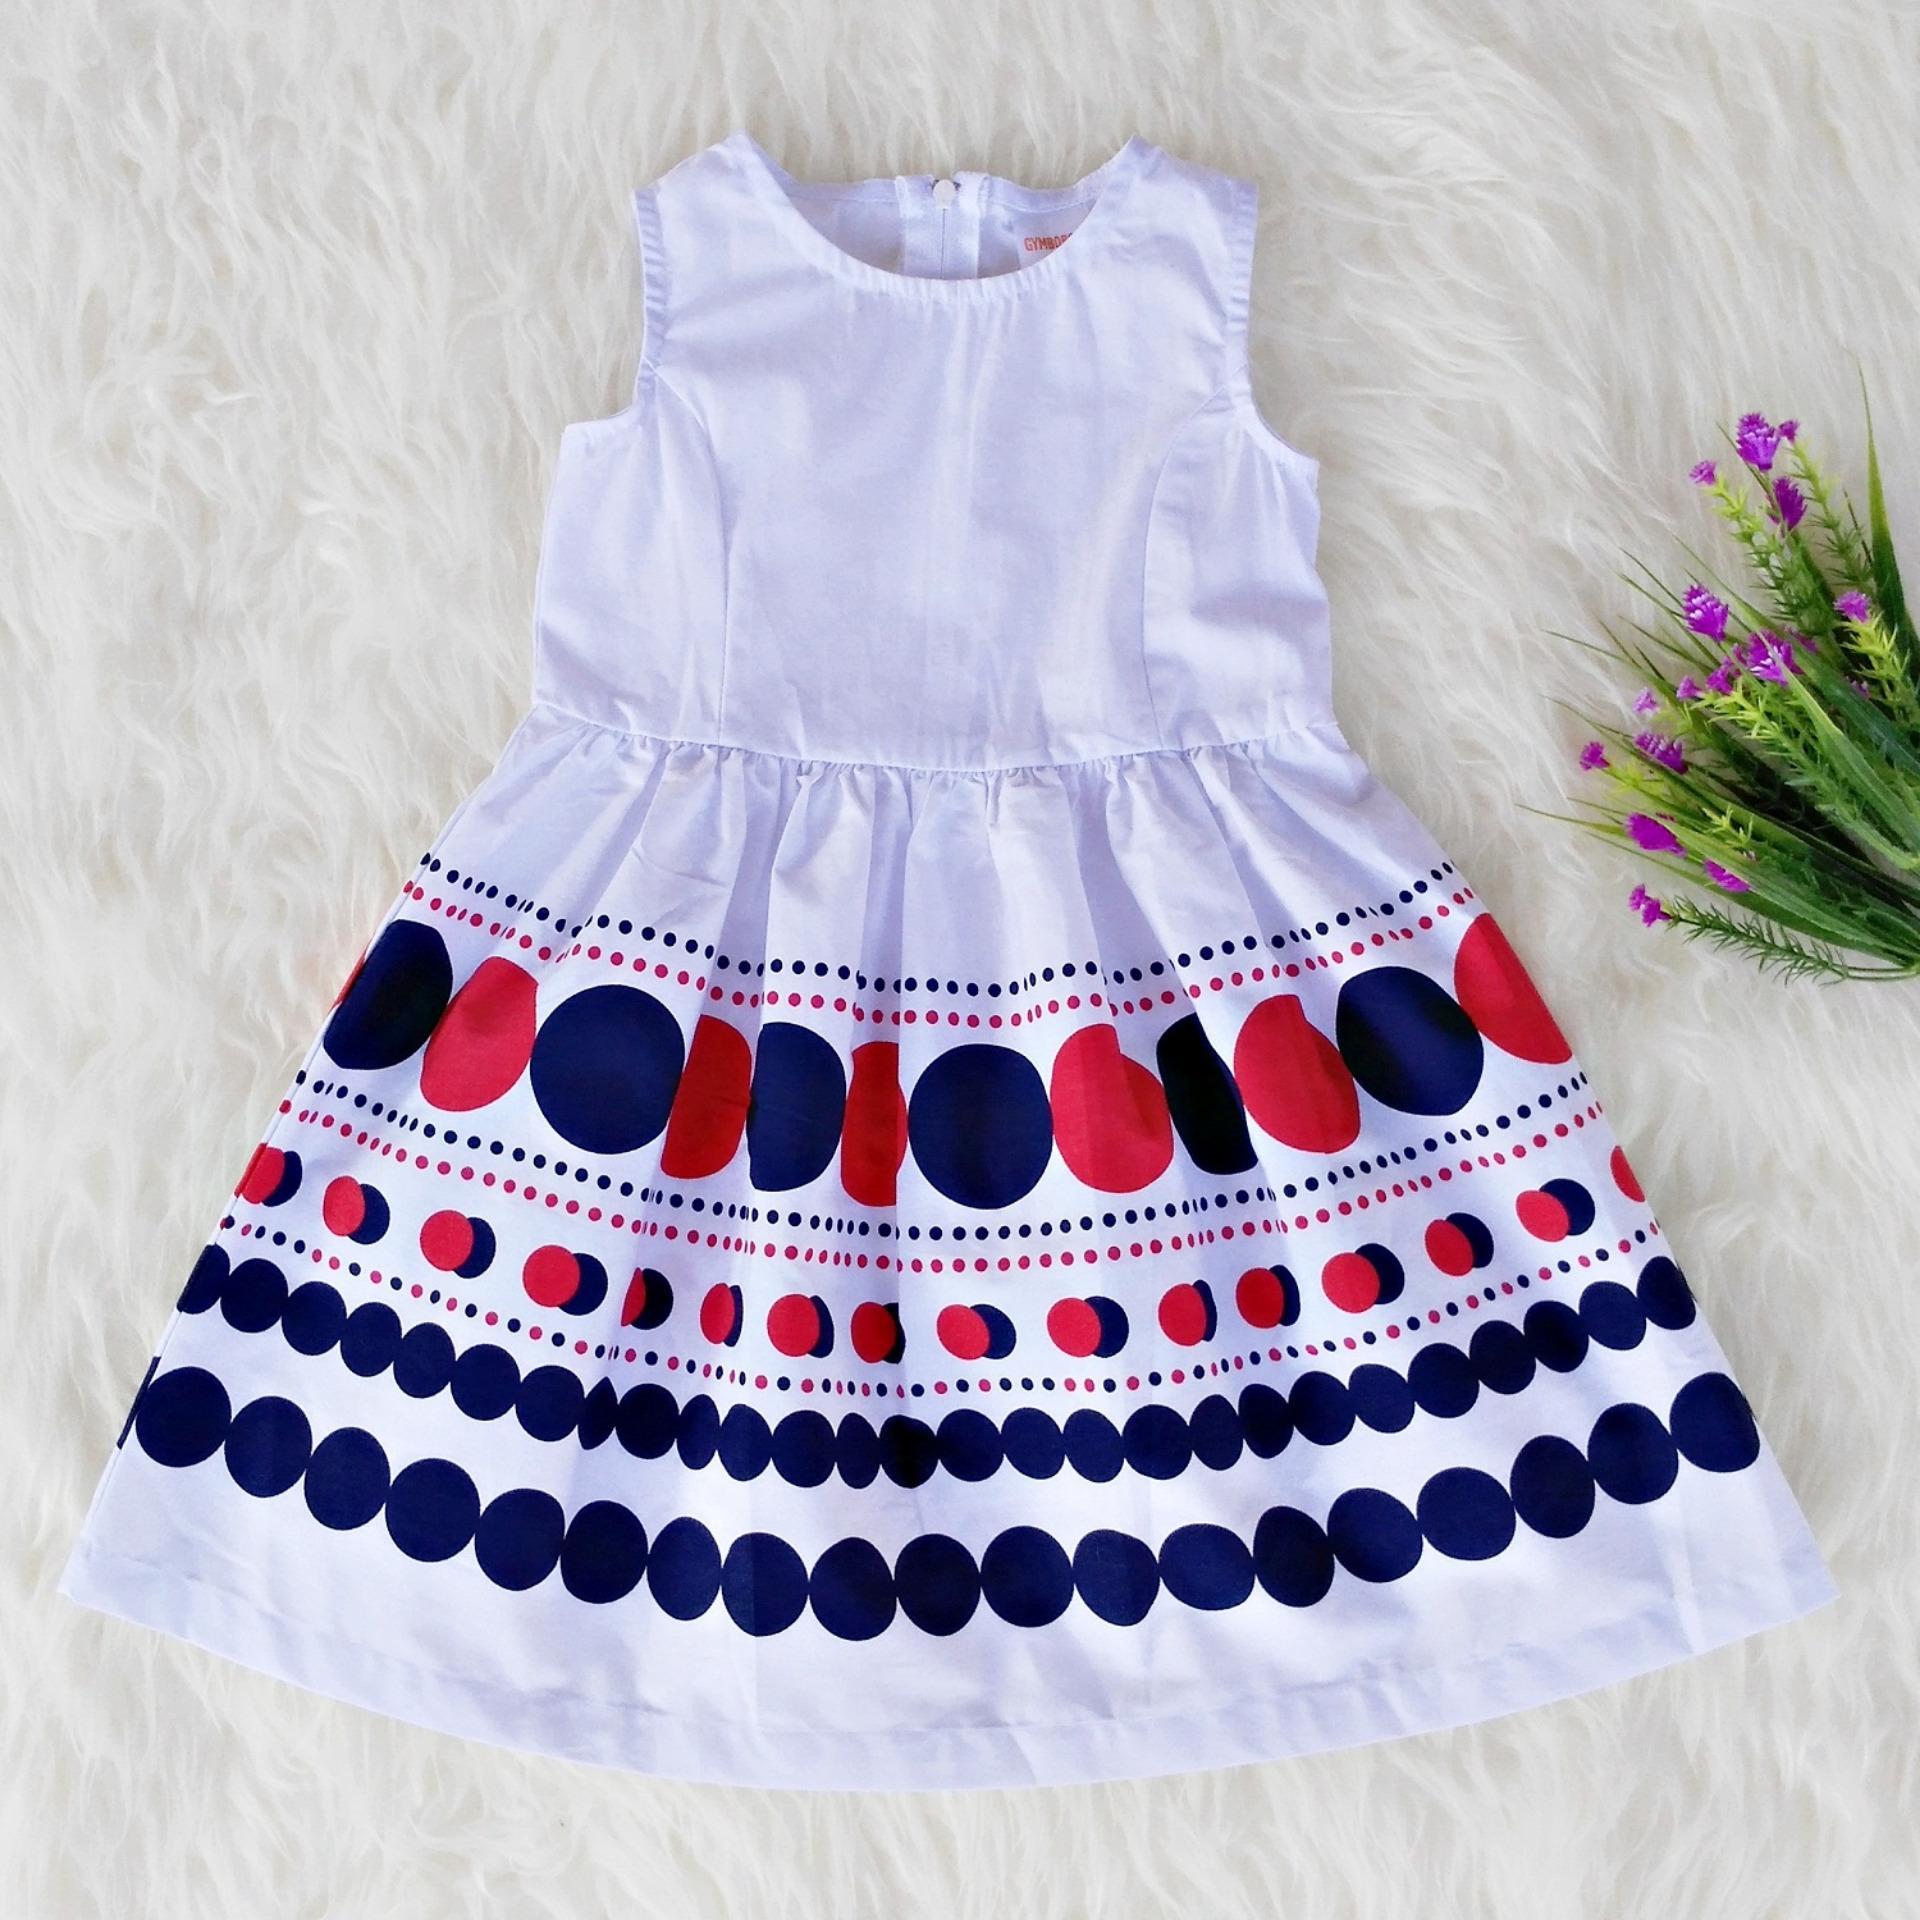 Dress Baju Anak Perempuan Sleeveless - Gym Polkadot